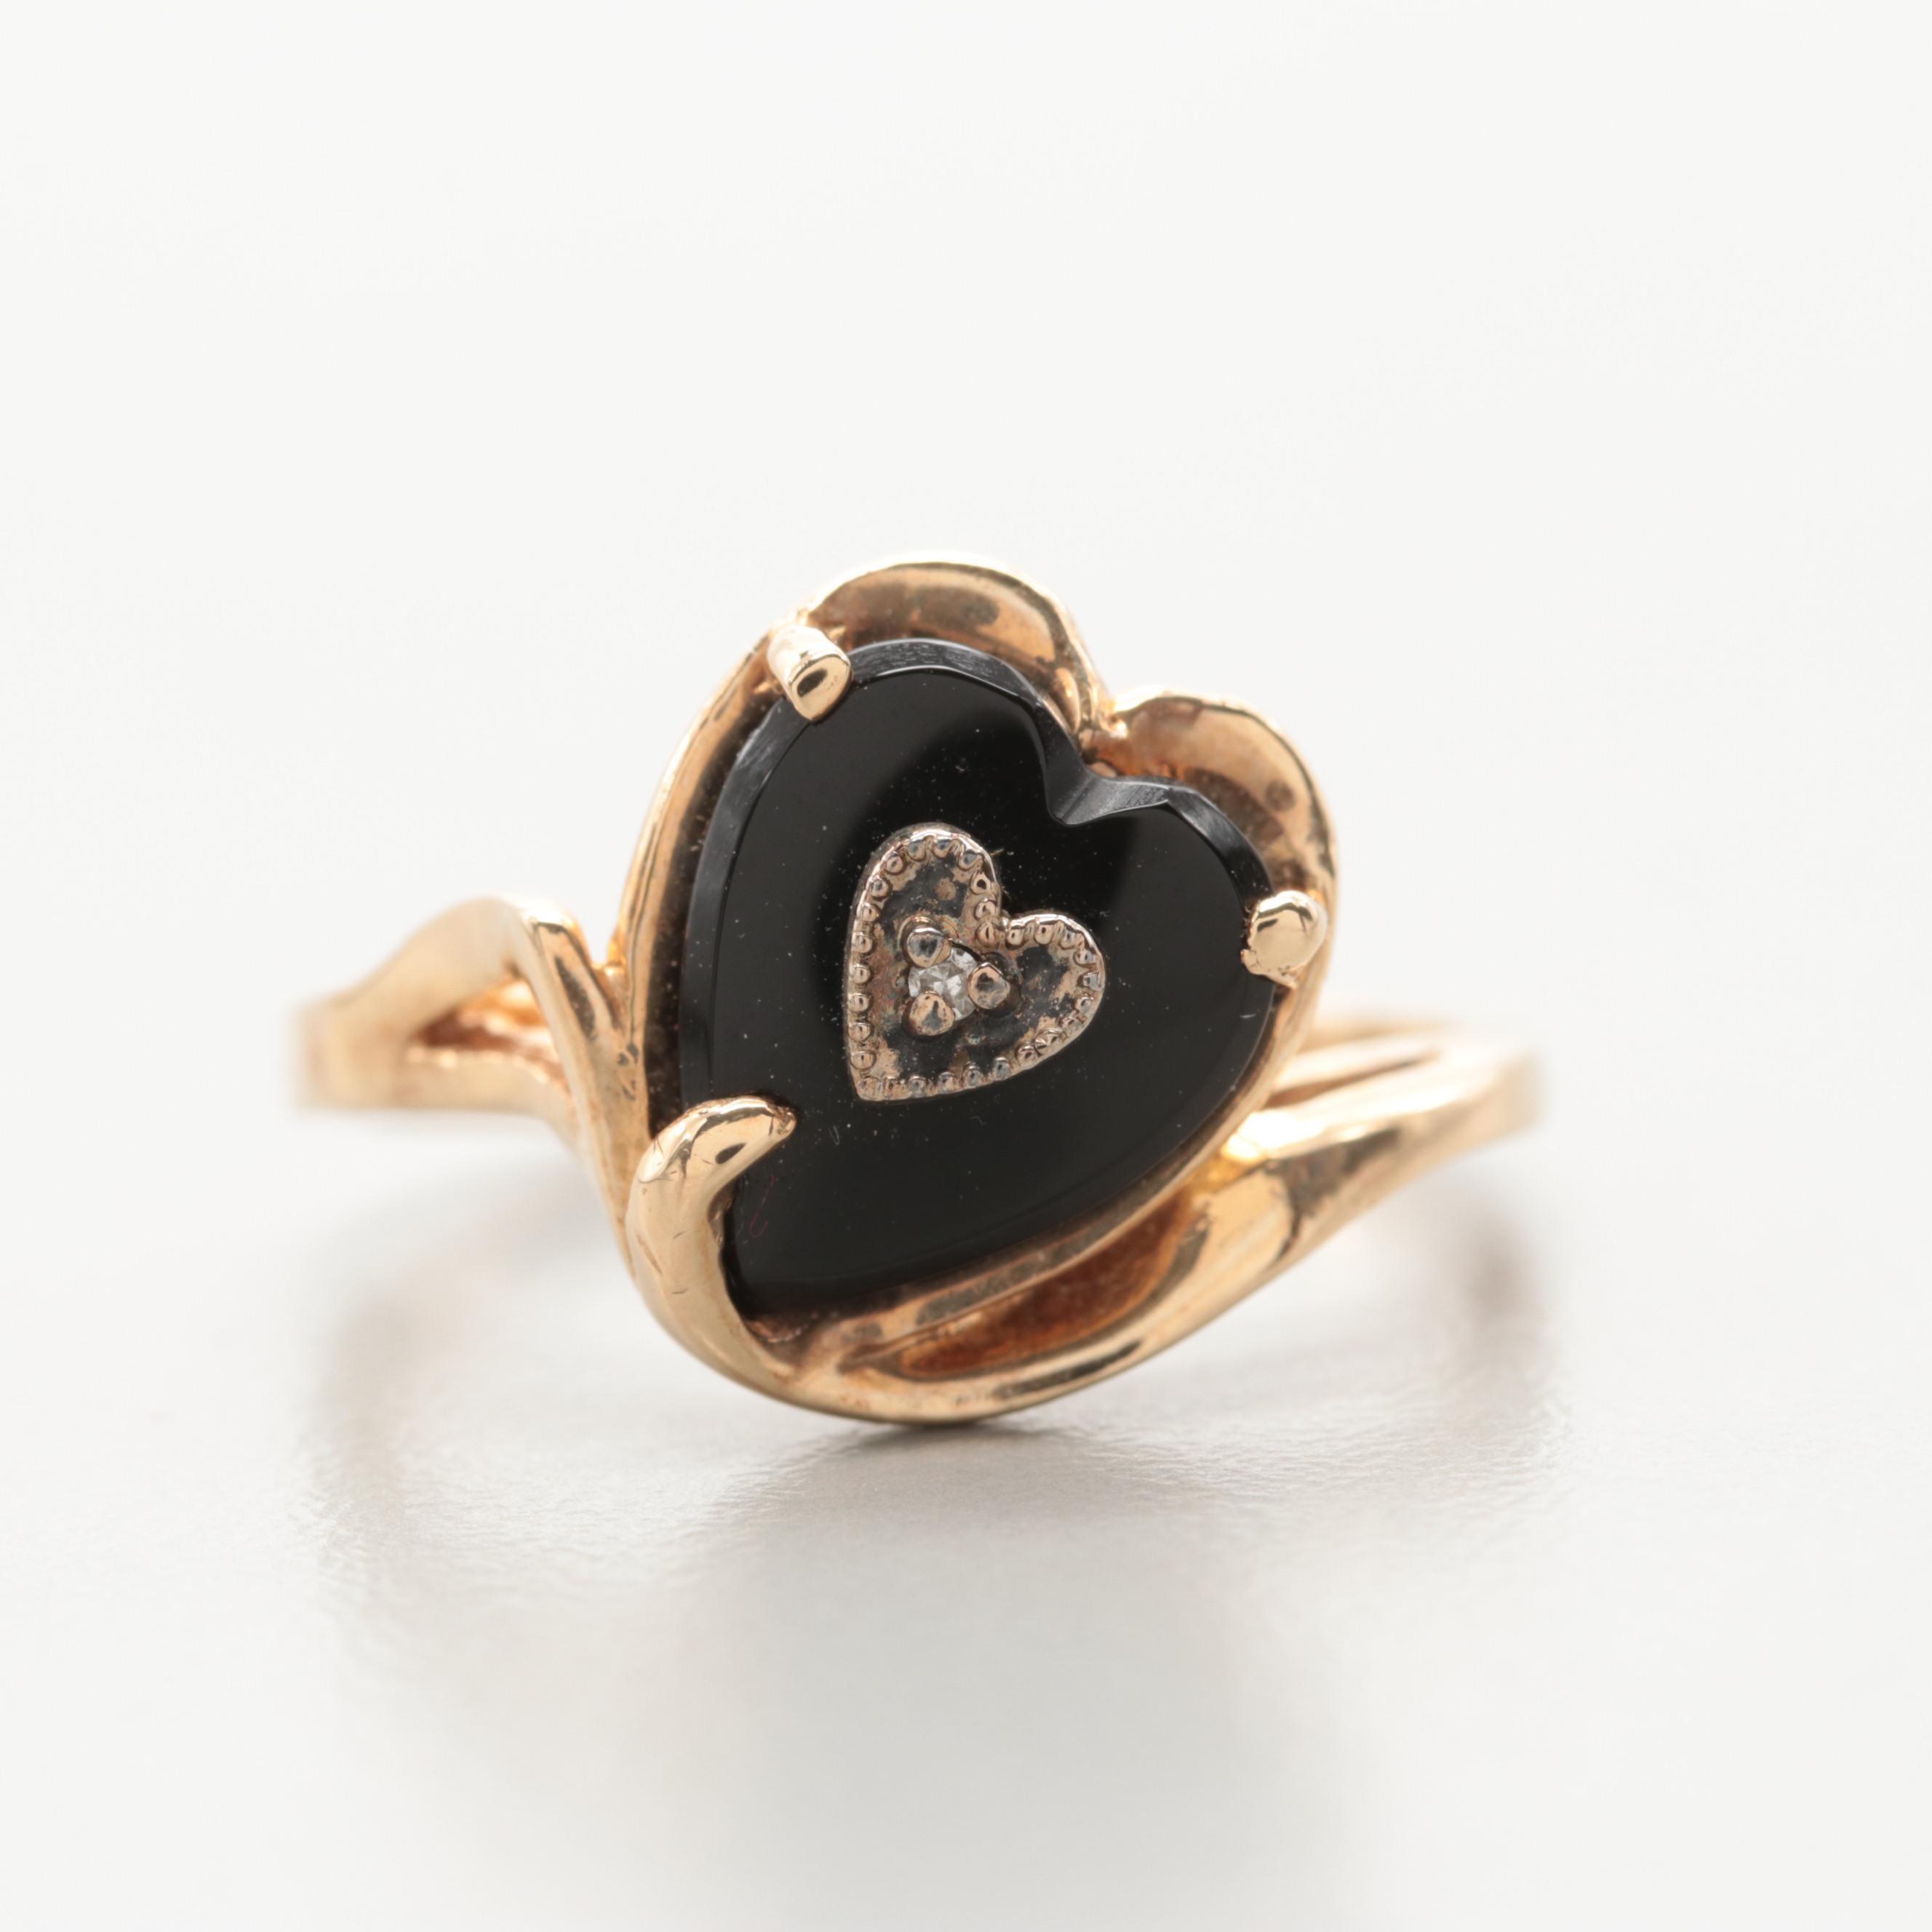 10K Yellow Gold Black Onyx and Diamond Ring